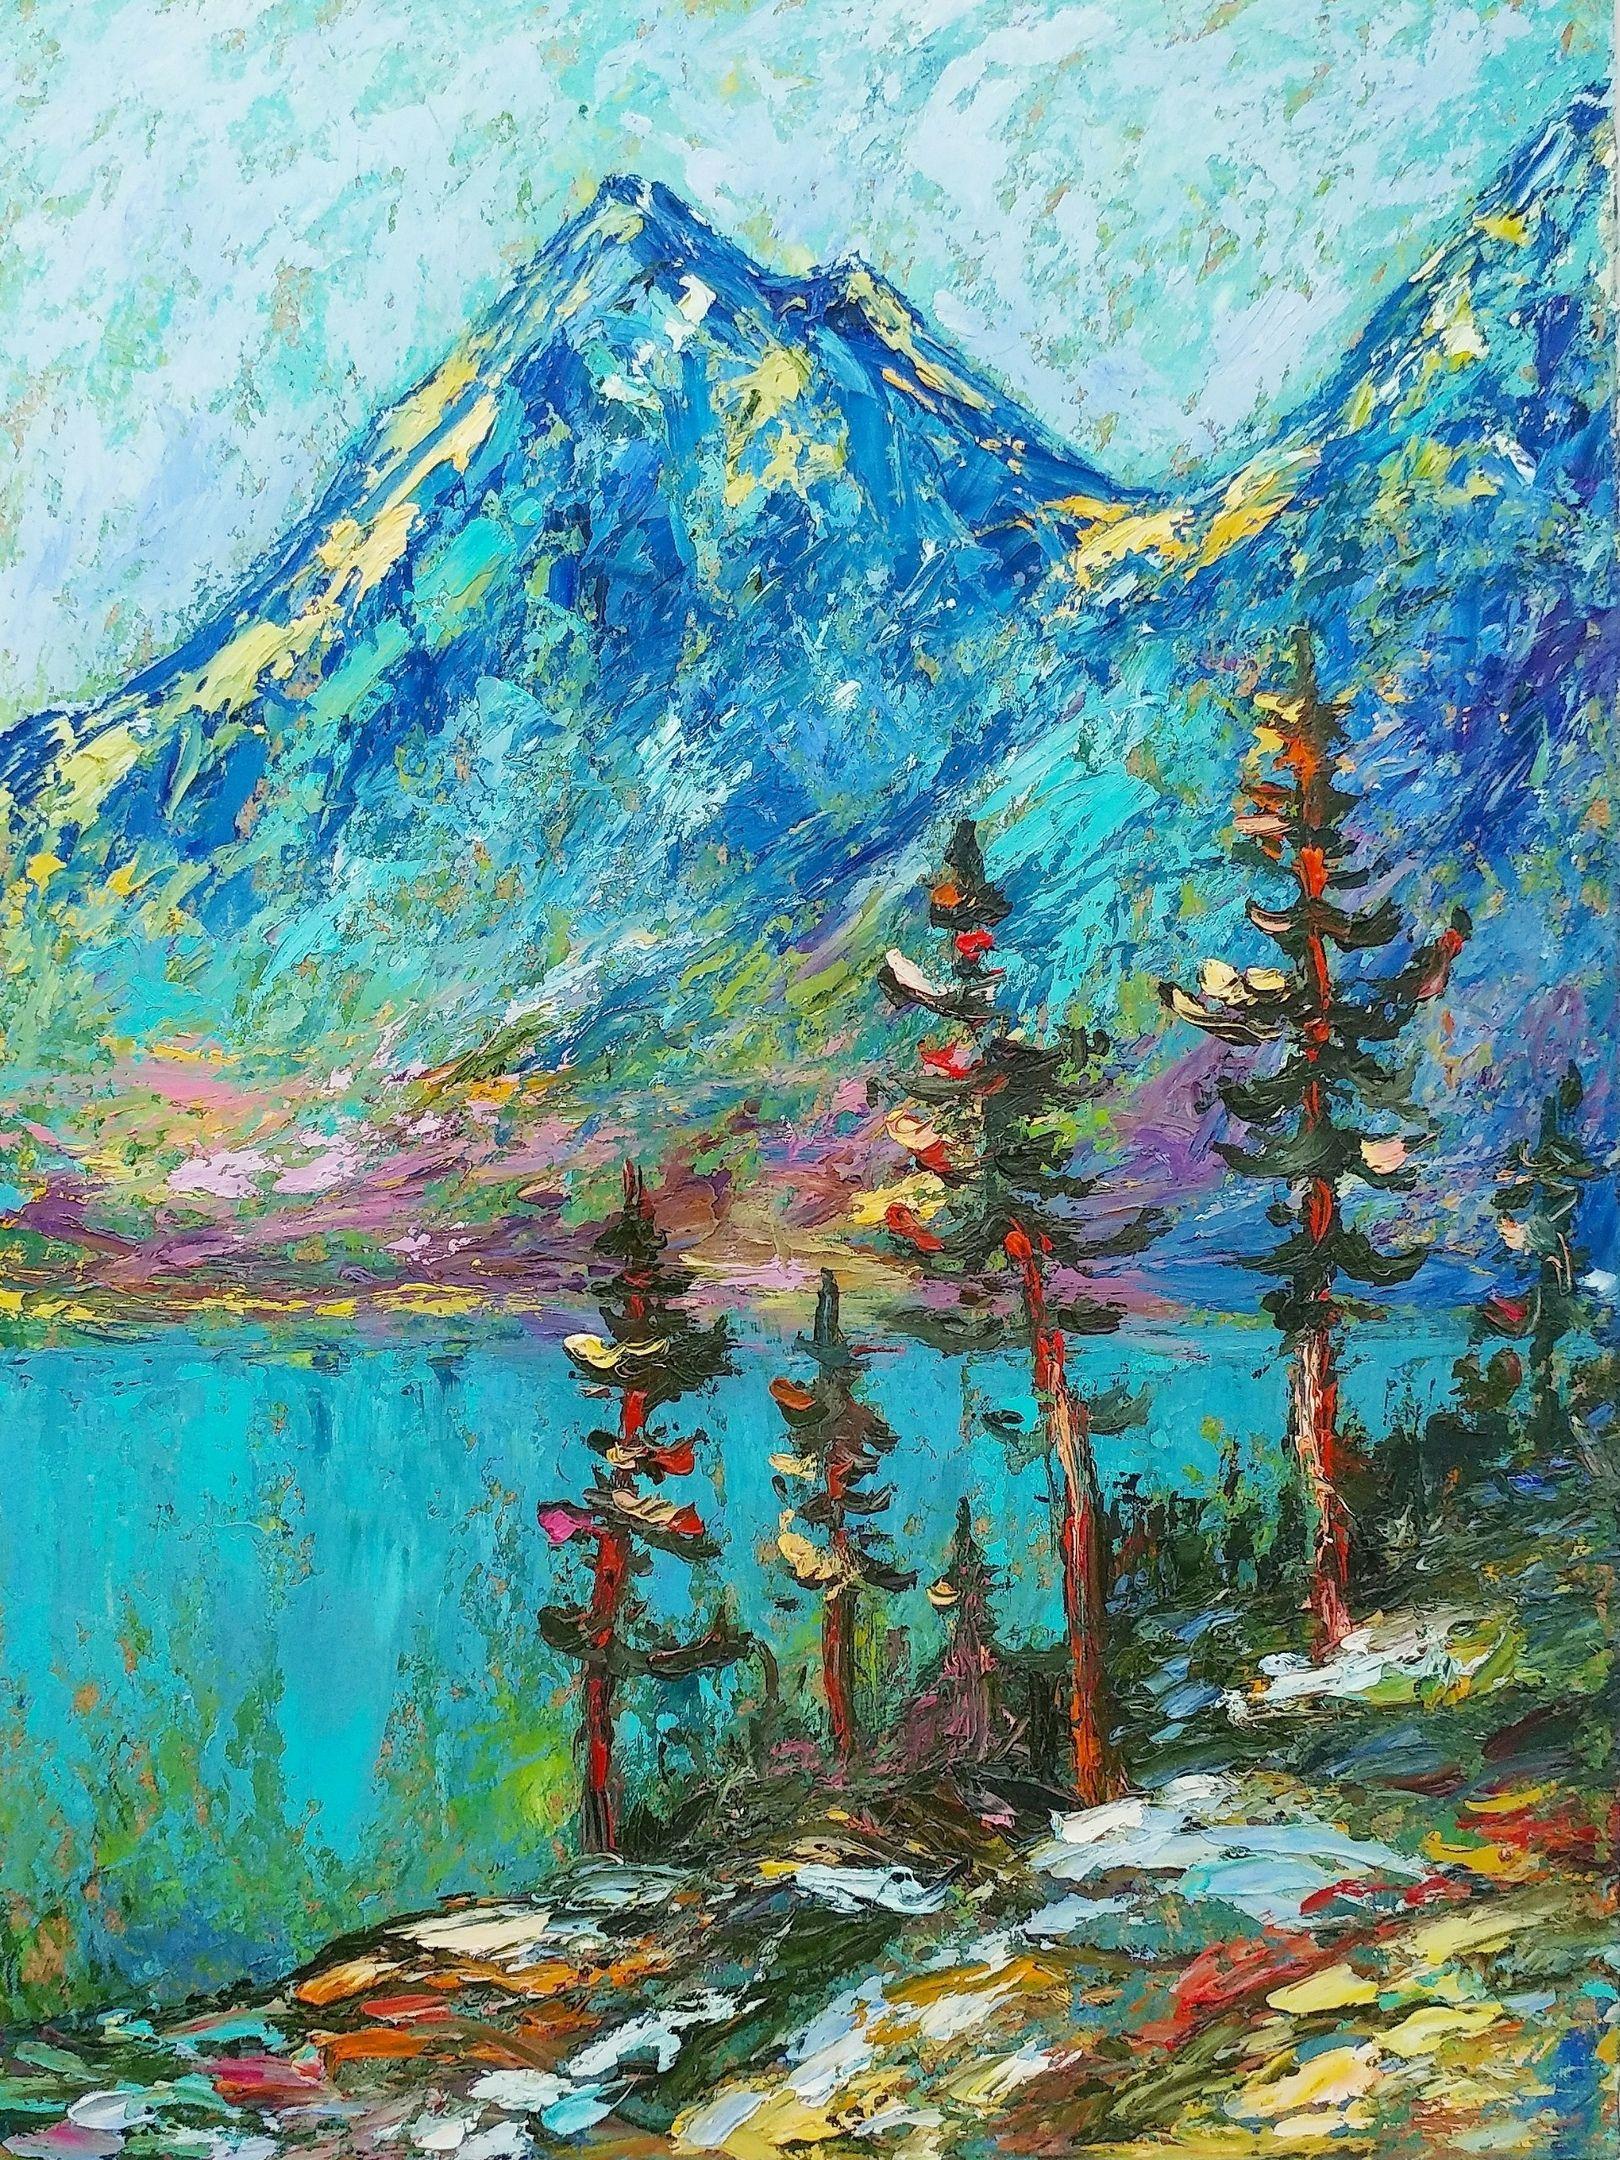 Kartina Maslom Gornyj Pejzazh Spokojstvie Gor Aukcion Na Bemypaint Landscape Oil Paintings Mountain Mountain Paintings Amazing Art Painting